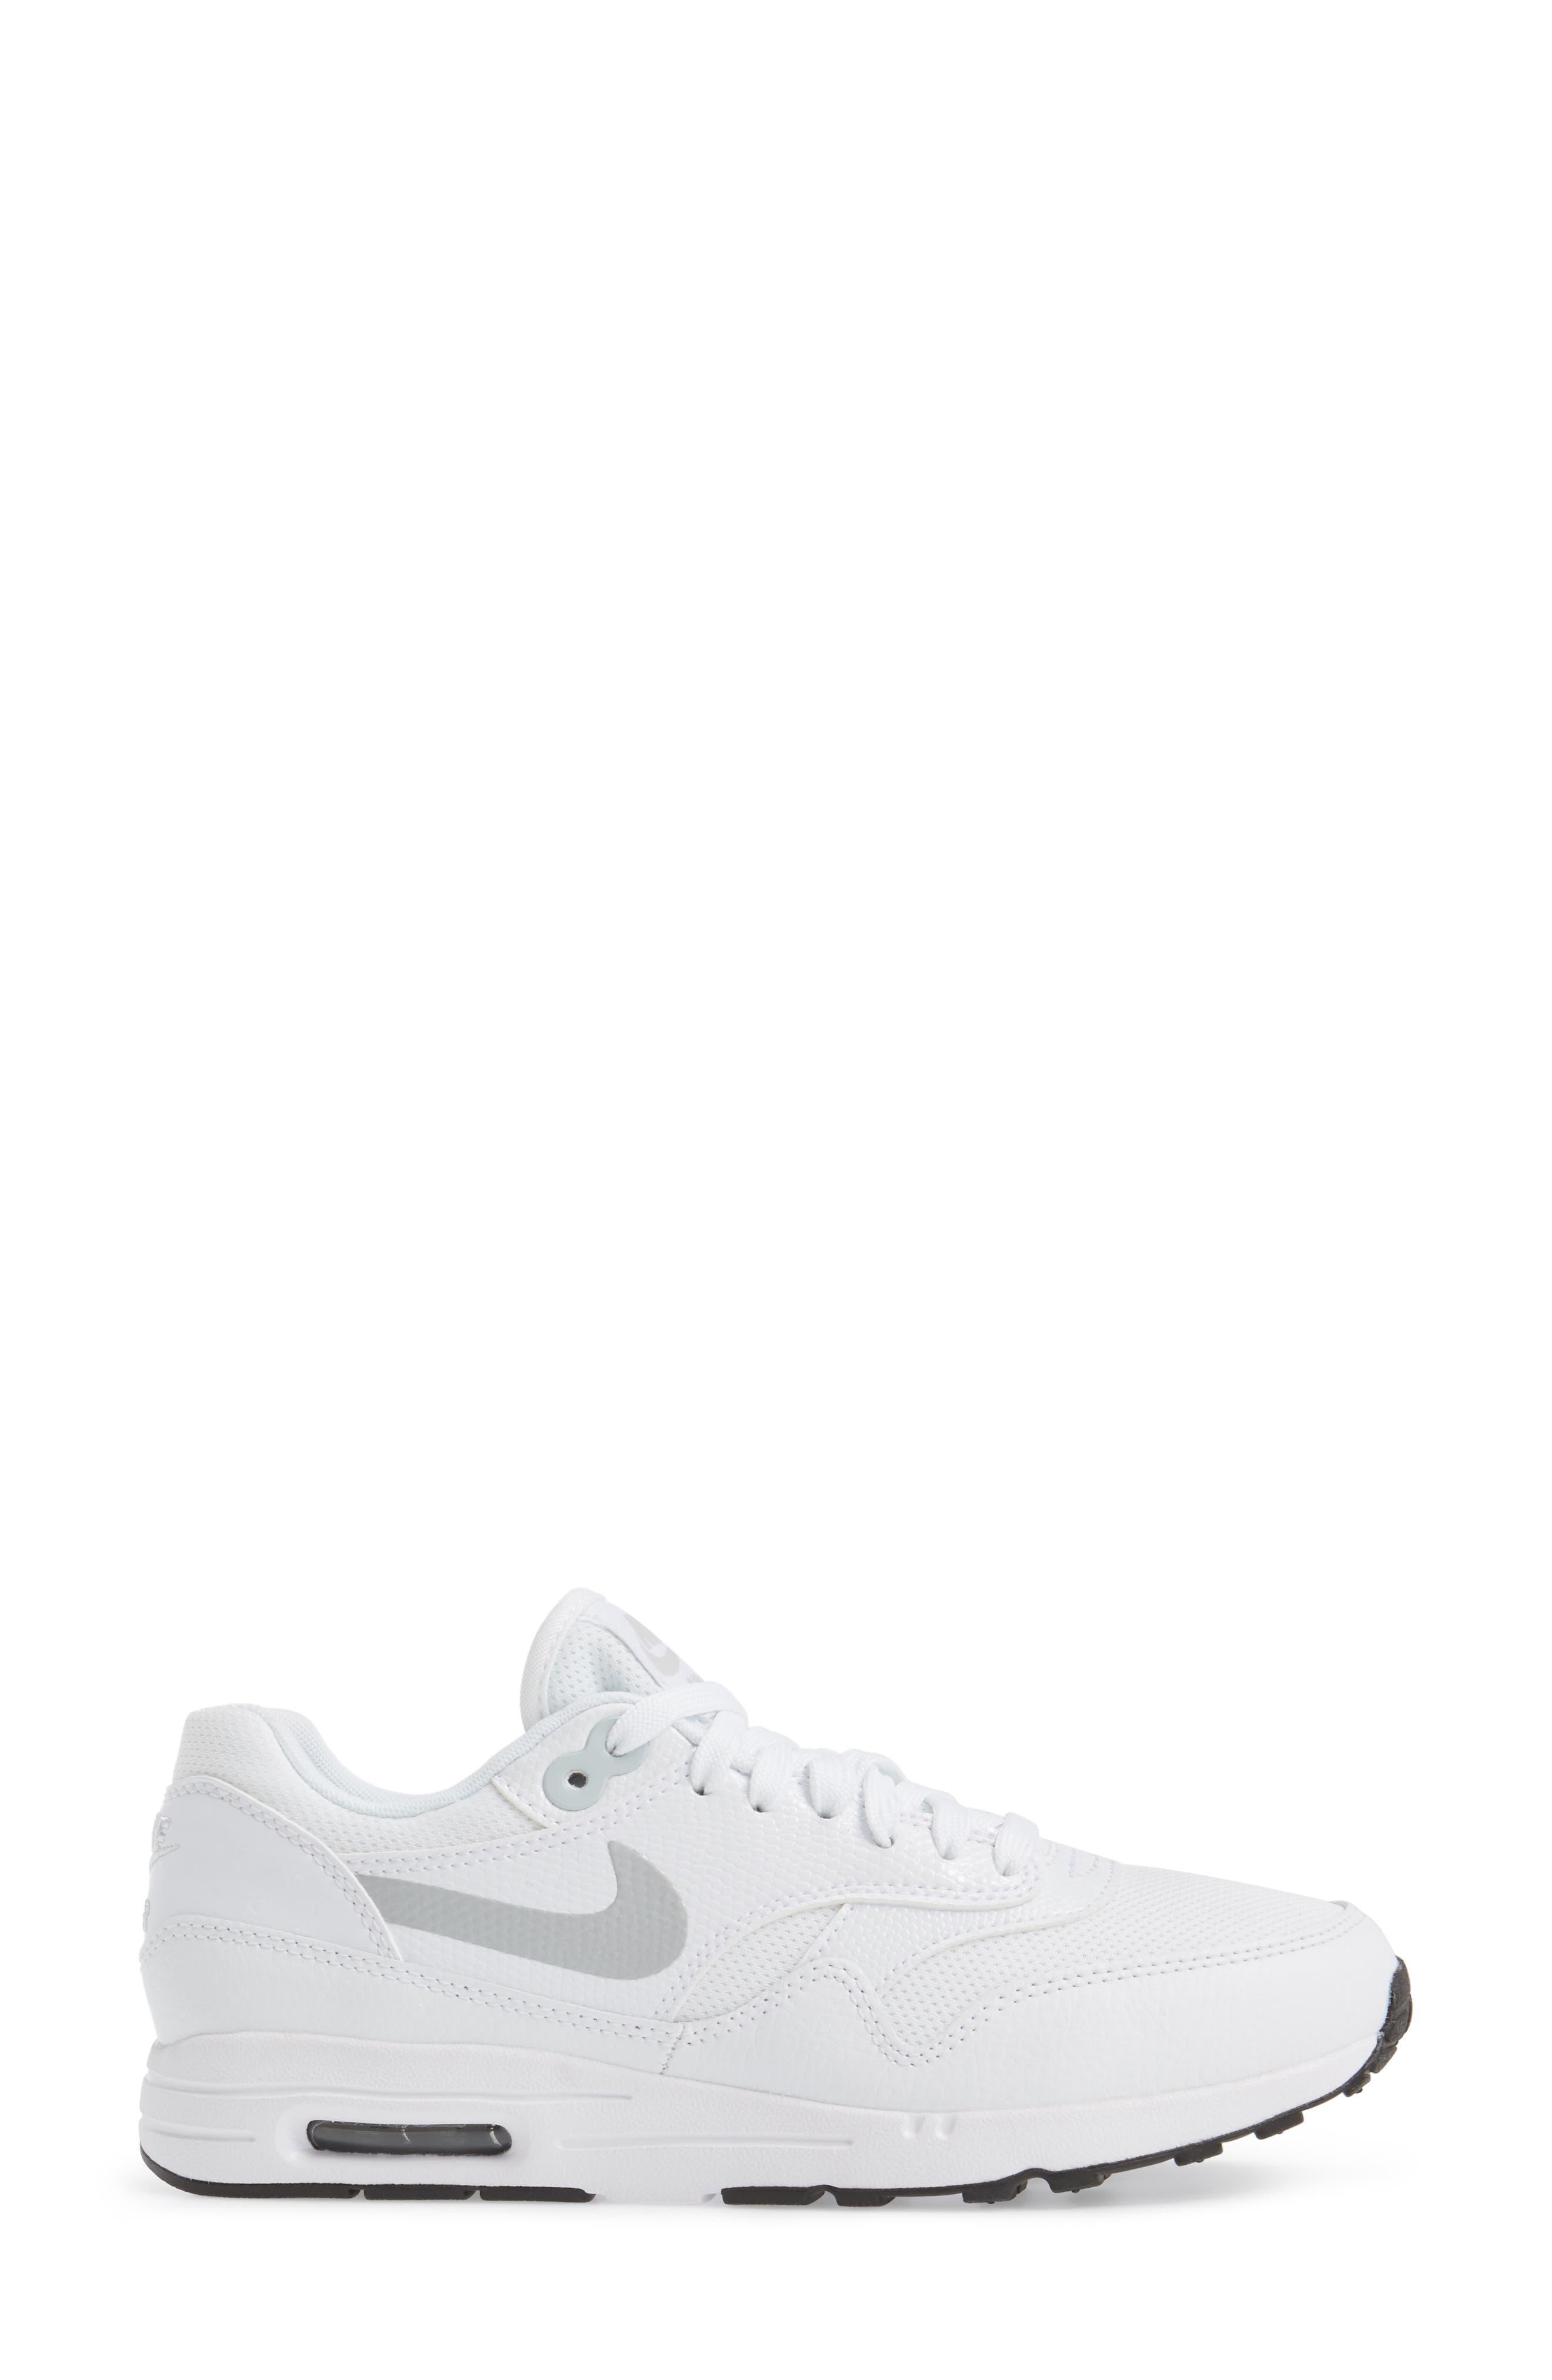 Air Max 1 Ultra 2.0 Running Shoe,                             Alternate thumbnail 3, color,                             White/ Platinum/ Black/ White